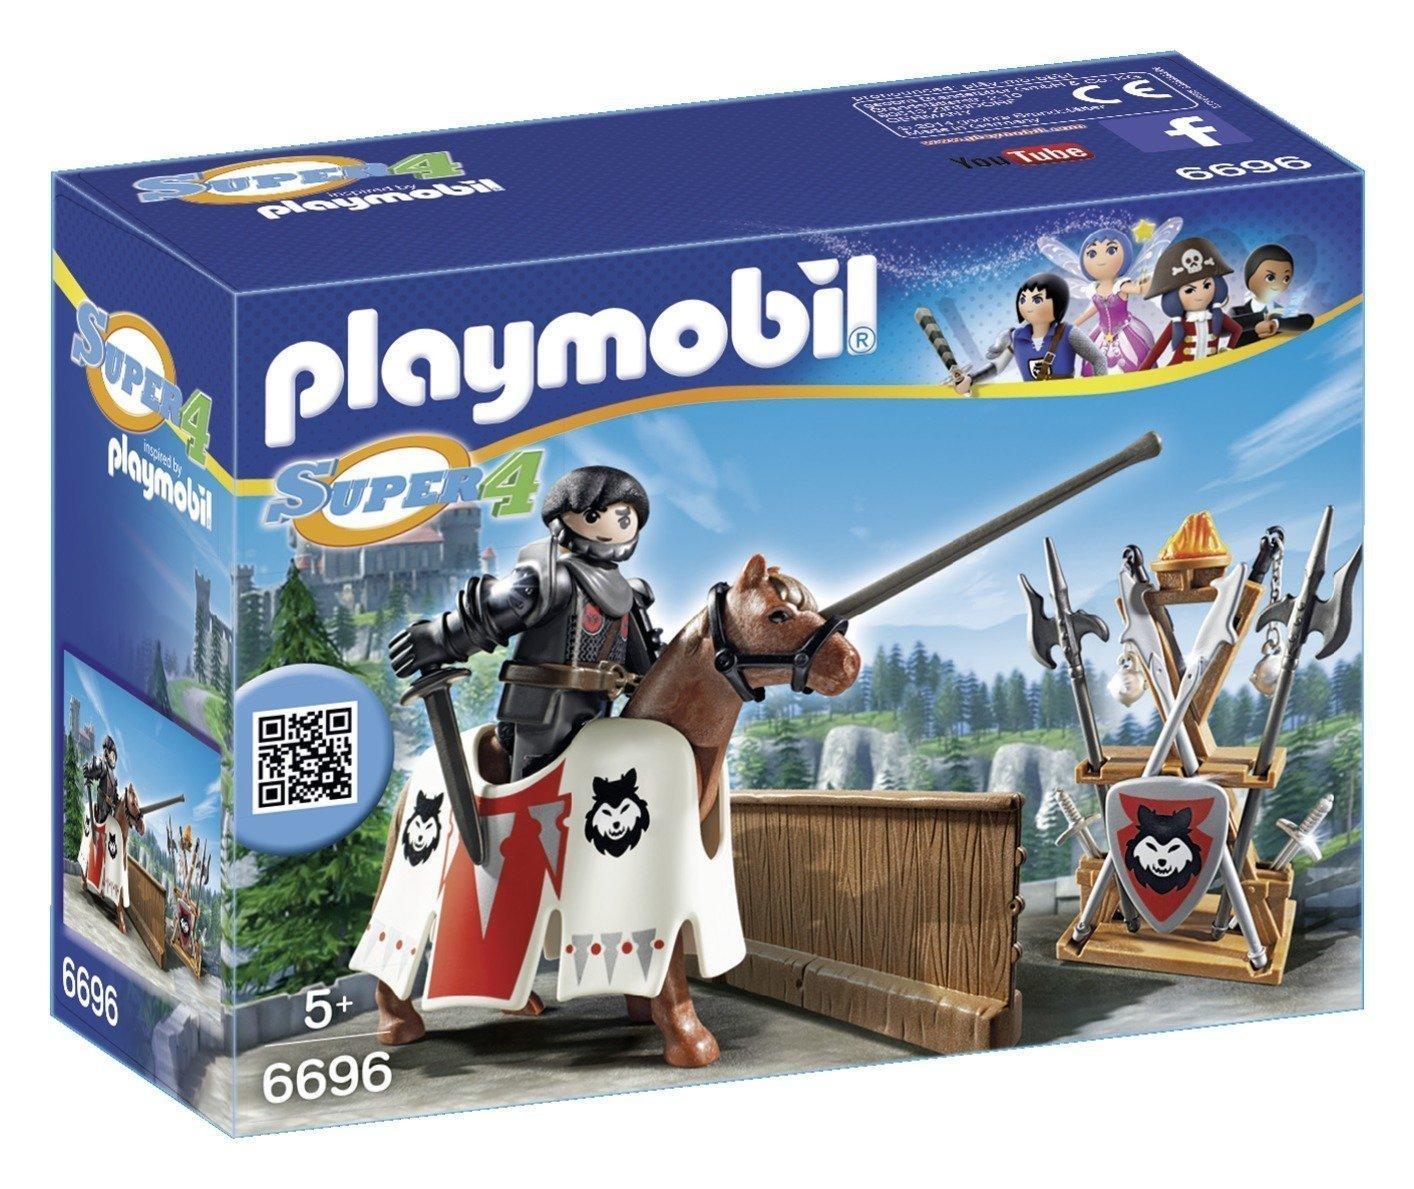 [Premium] Playmobil Rypan Gardien Du Baron - A1505521 - Super4